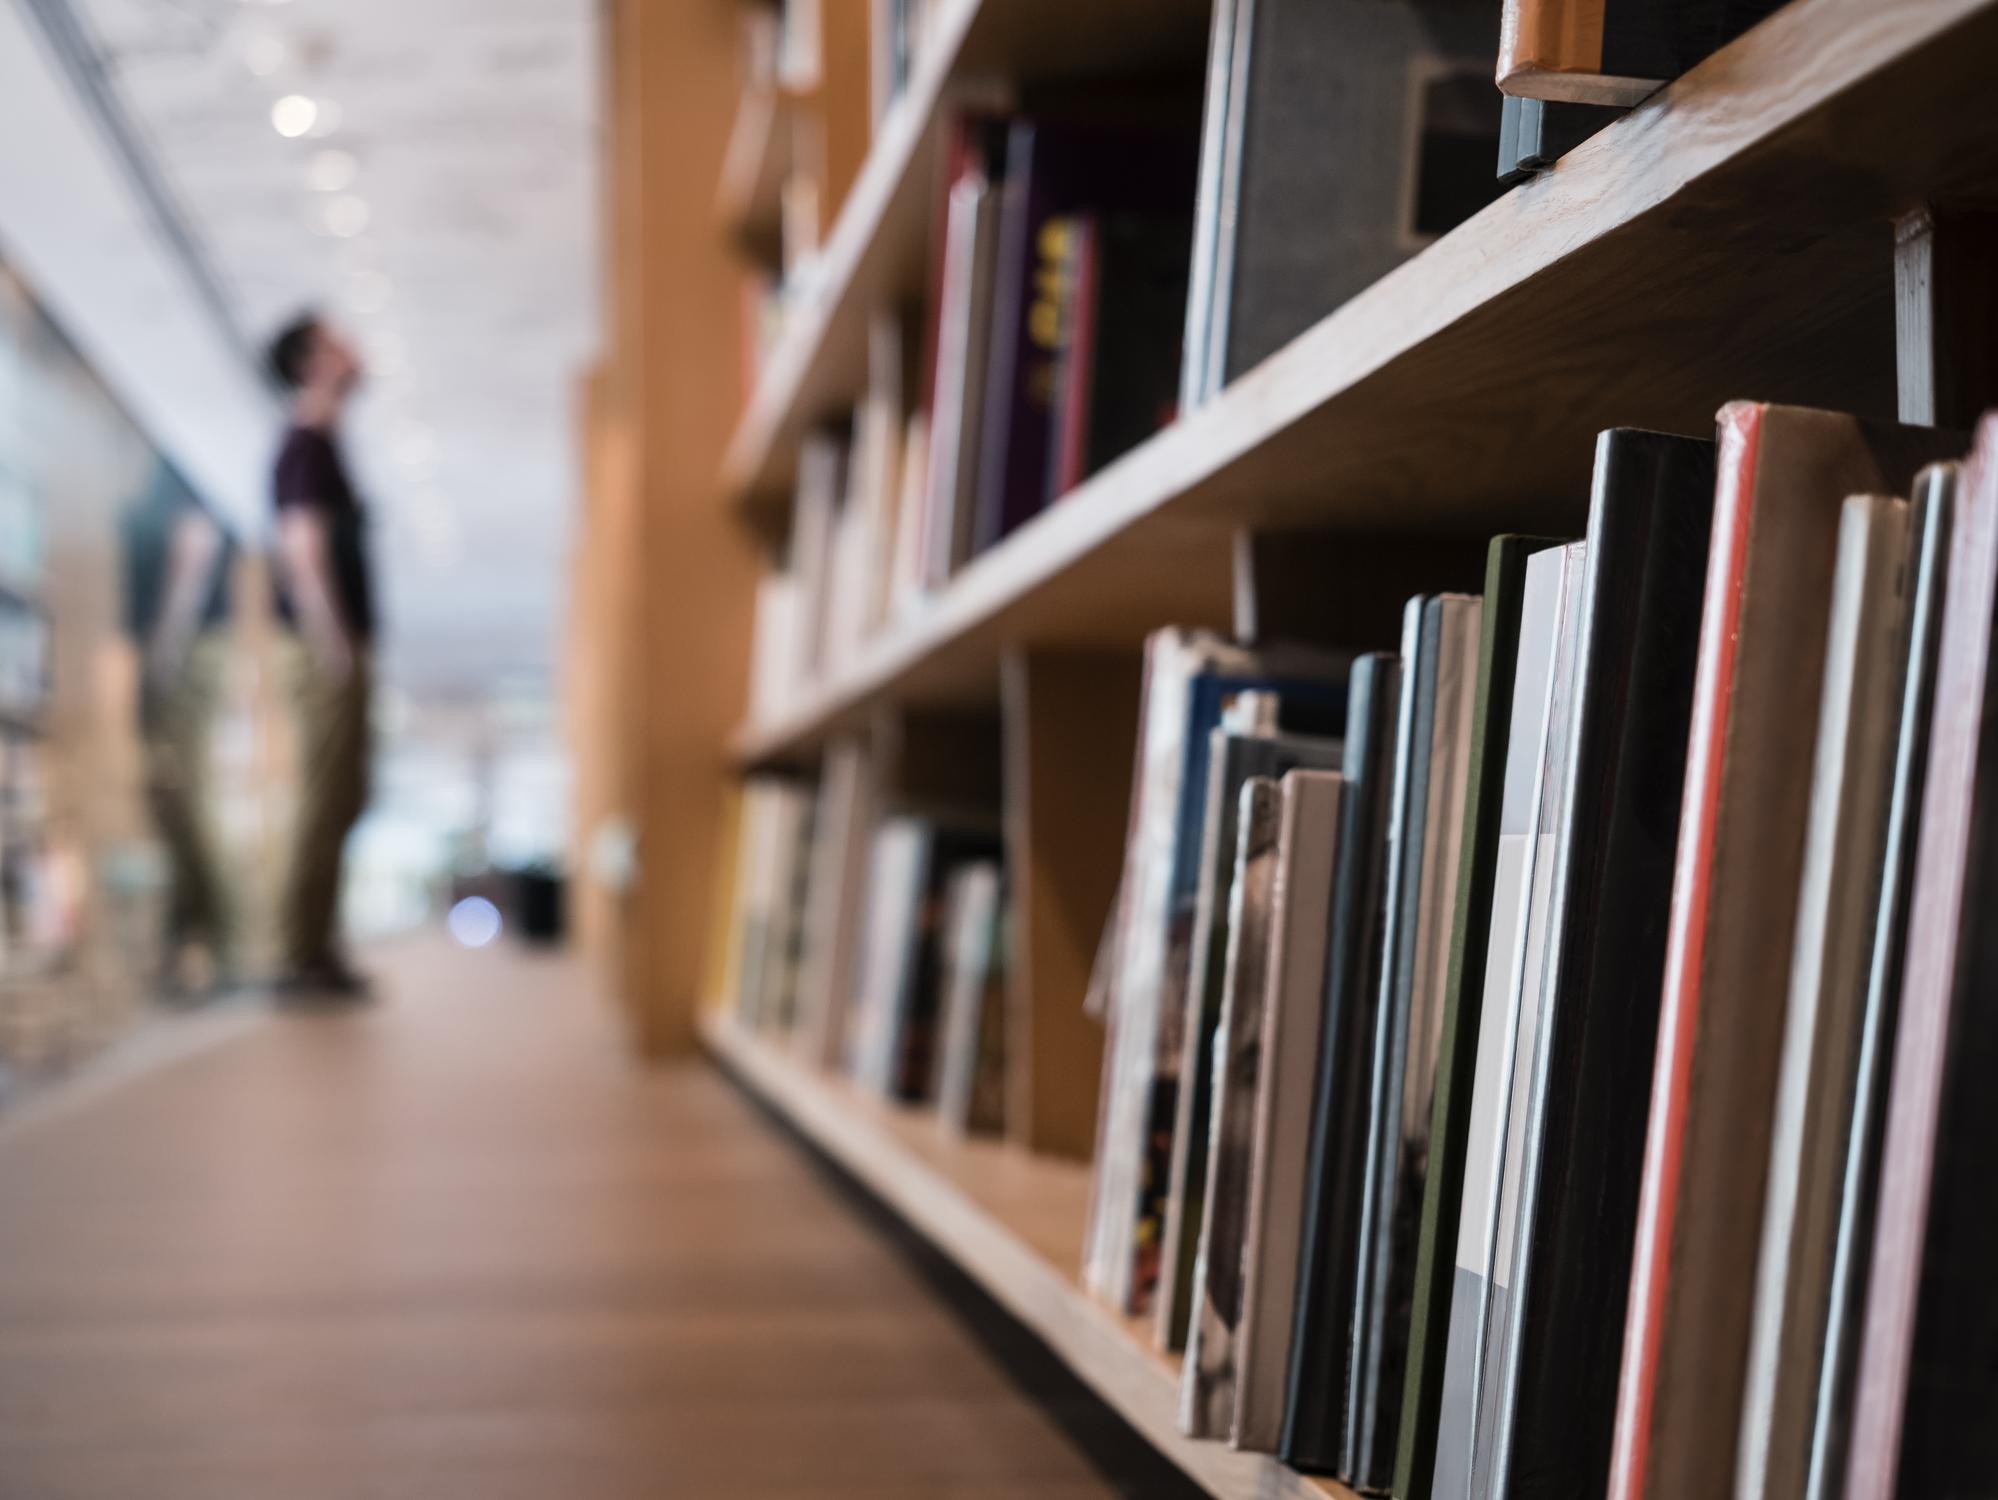 Close-up of books on a shelf in a bookstore